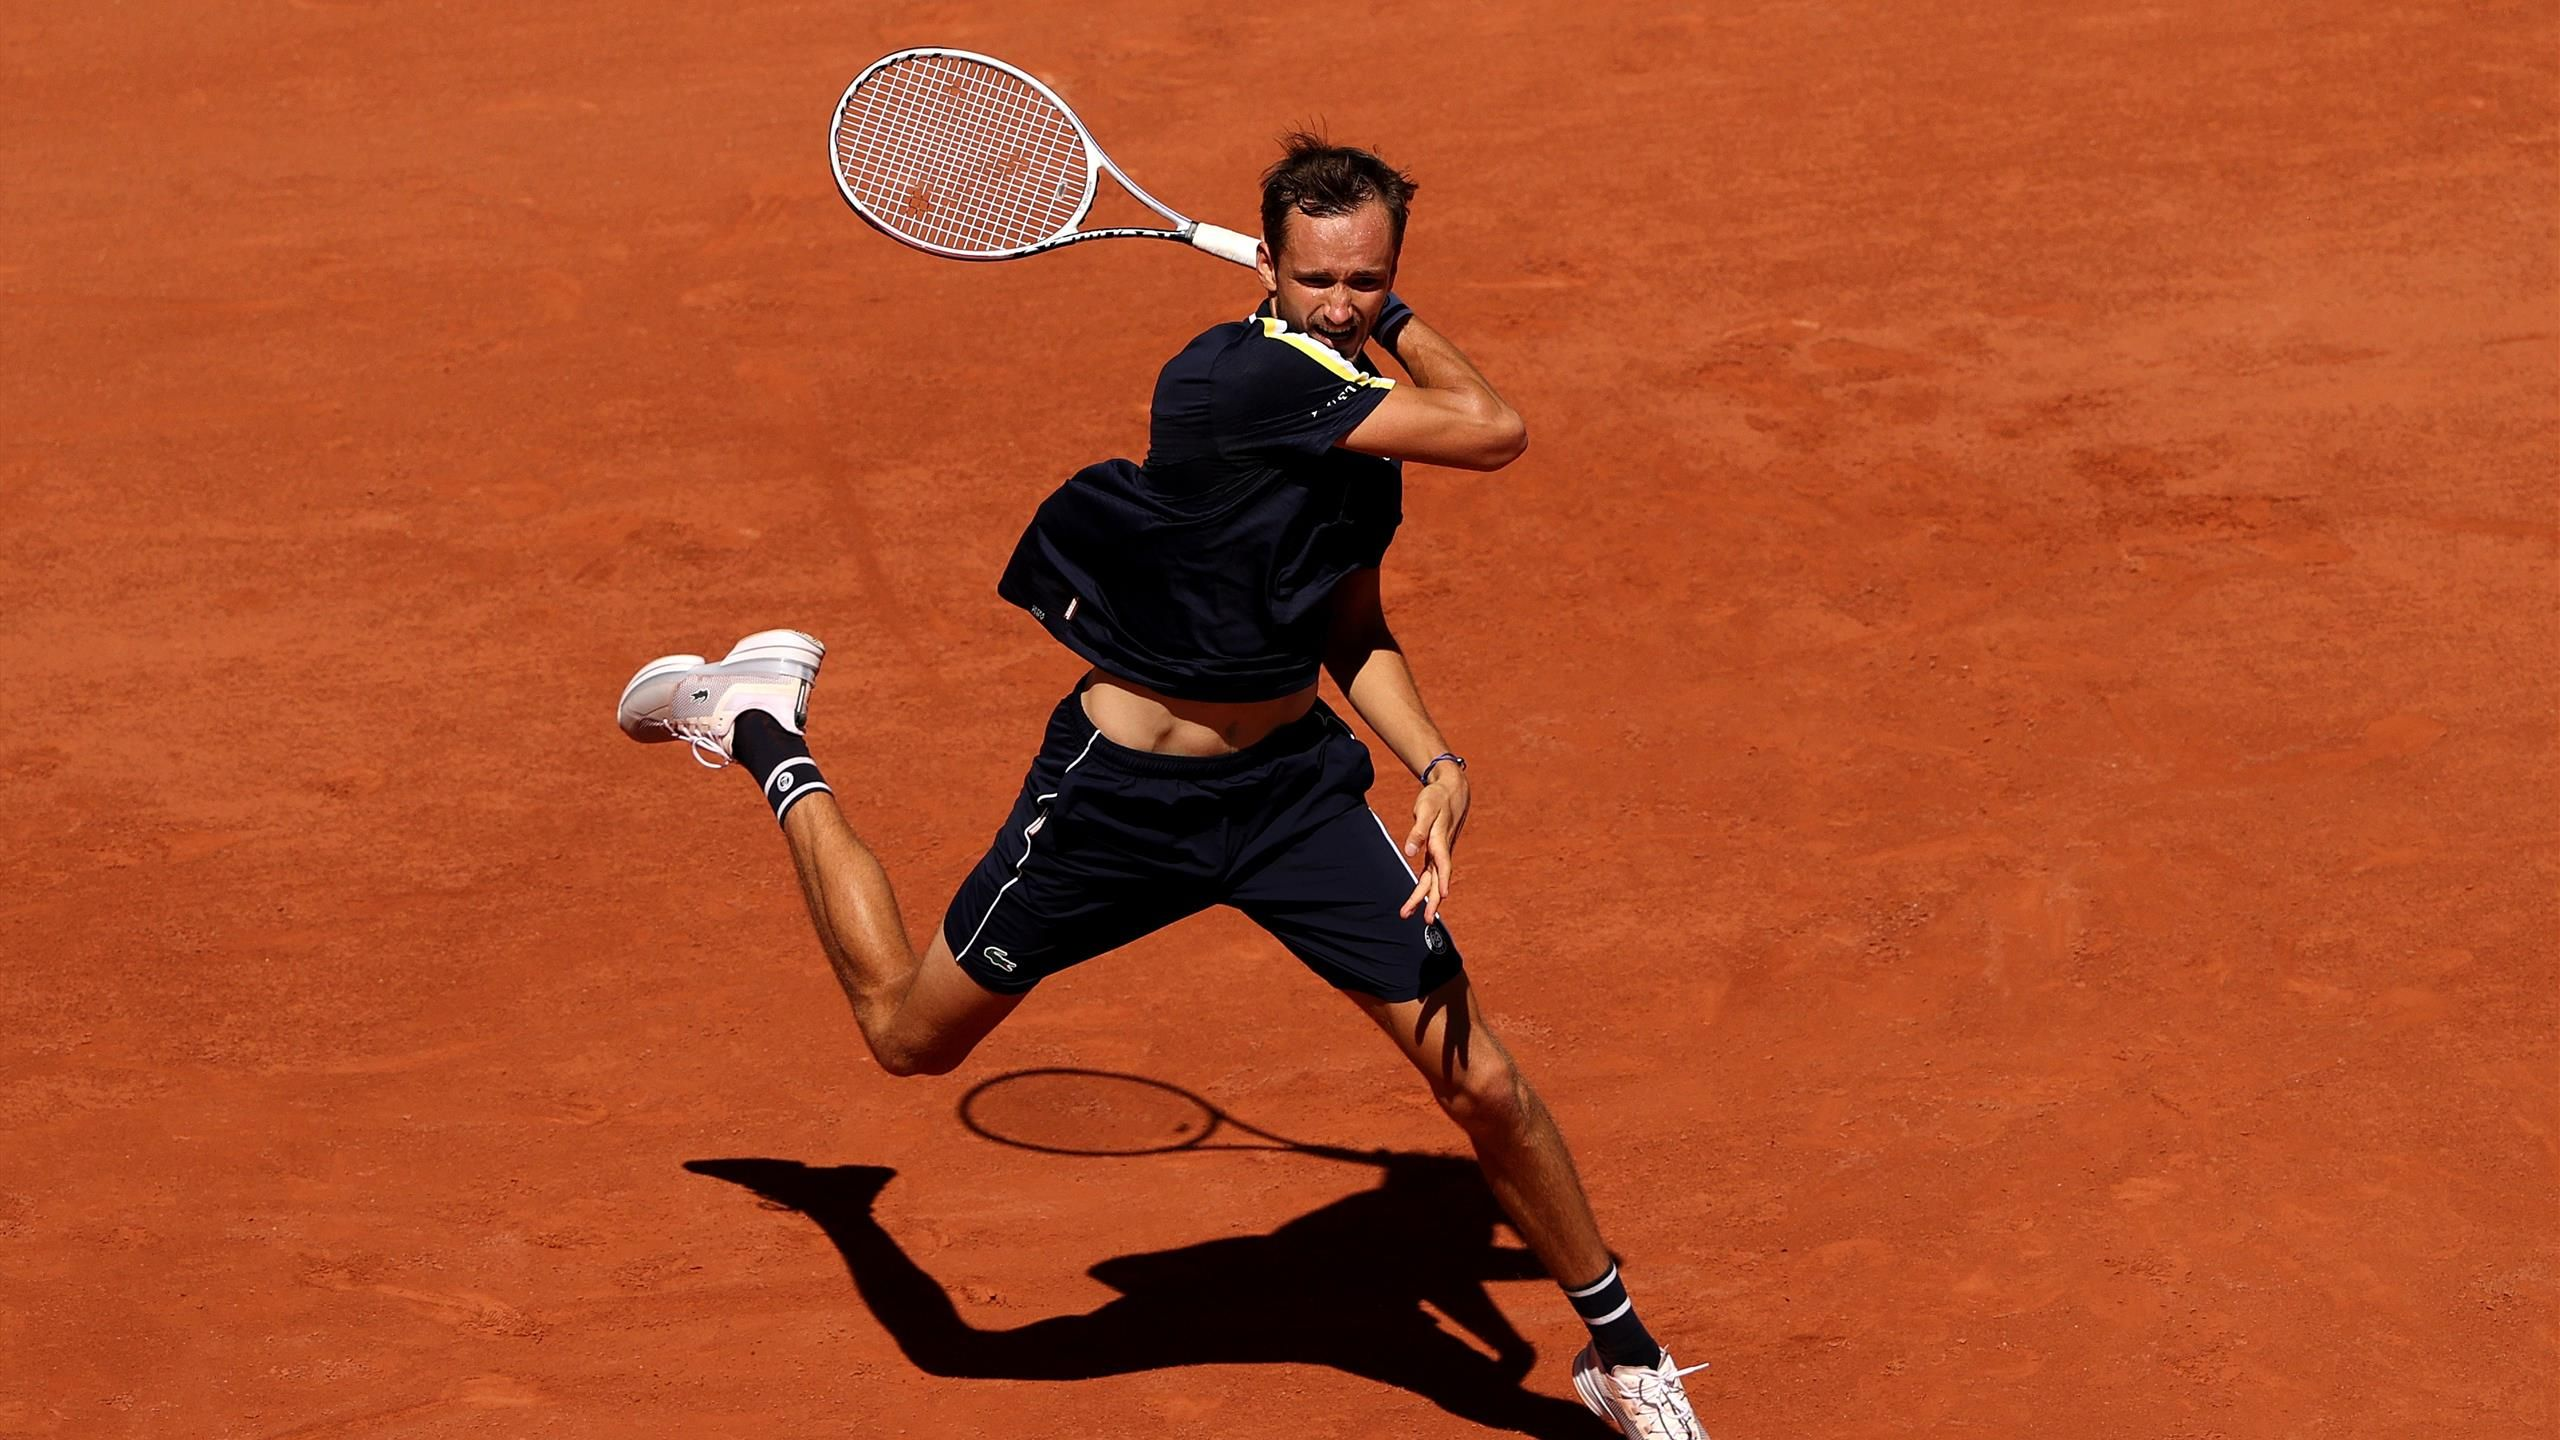 Roland Garros 2021: Daniil Medvedev vs. Tommy Paul Tennis Pick and Prediction